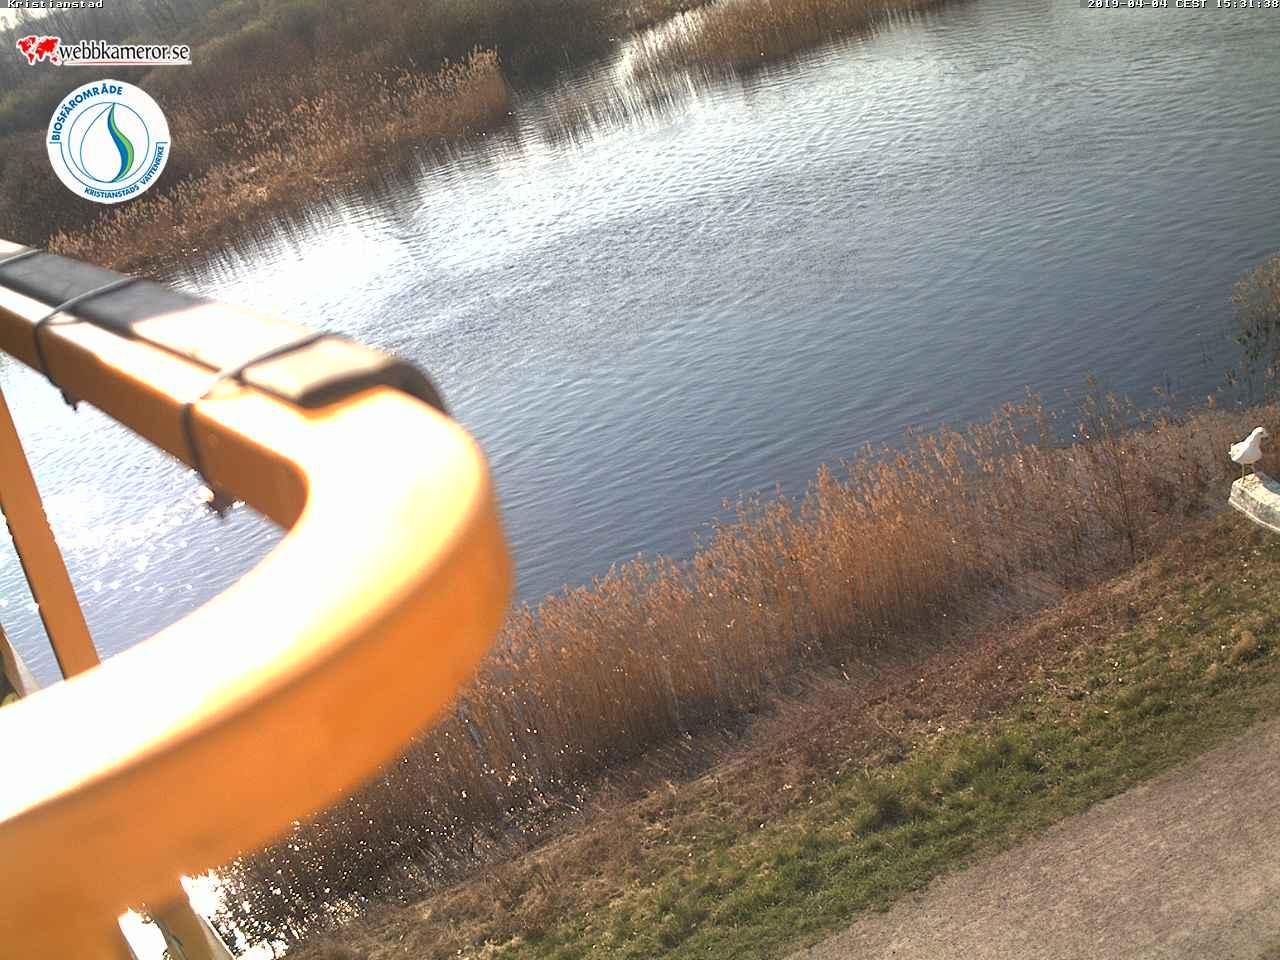 Webbkamera 2 - Naturum Vattenriket